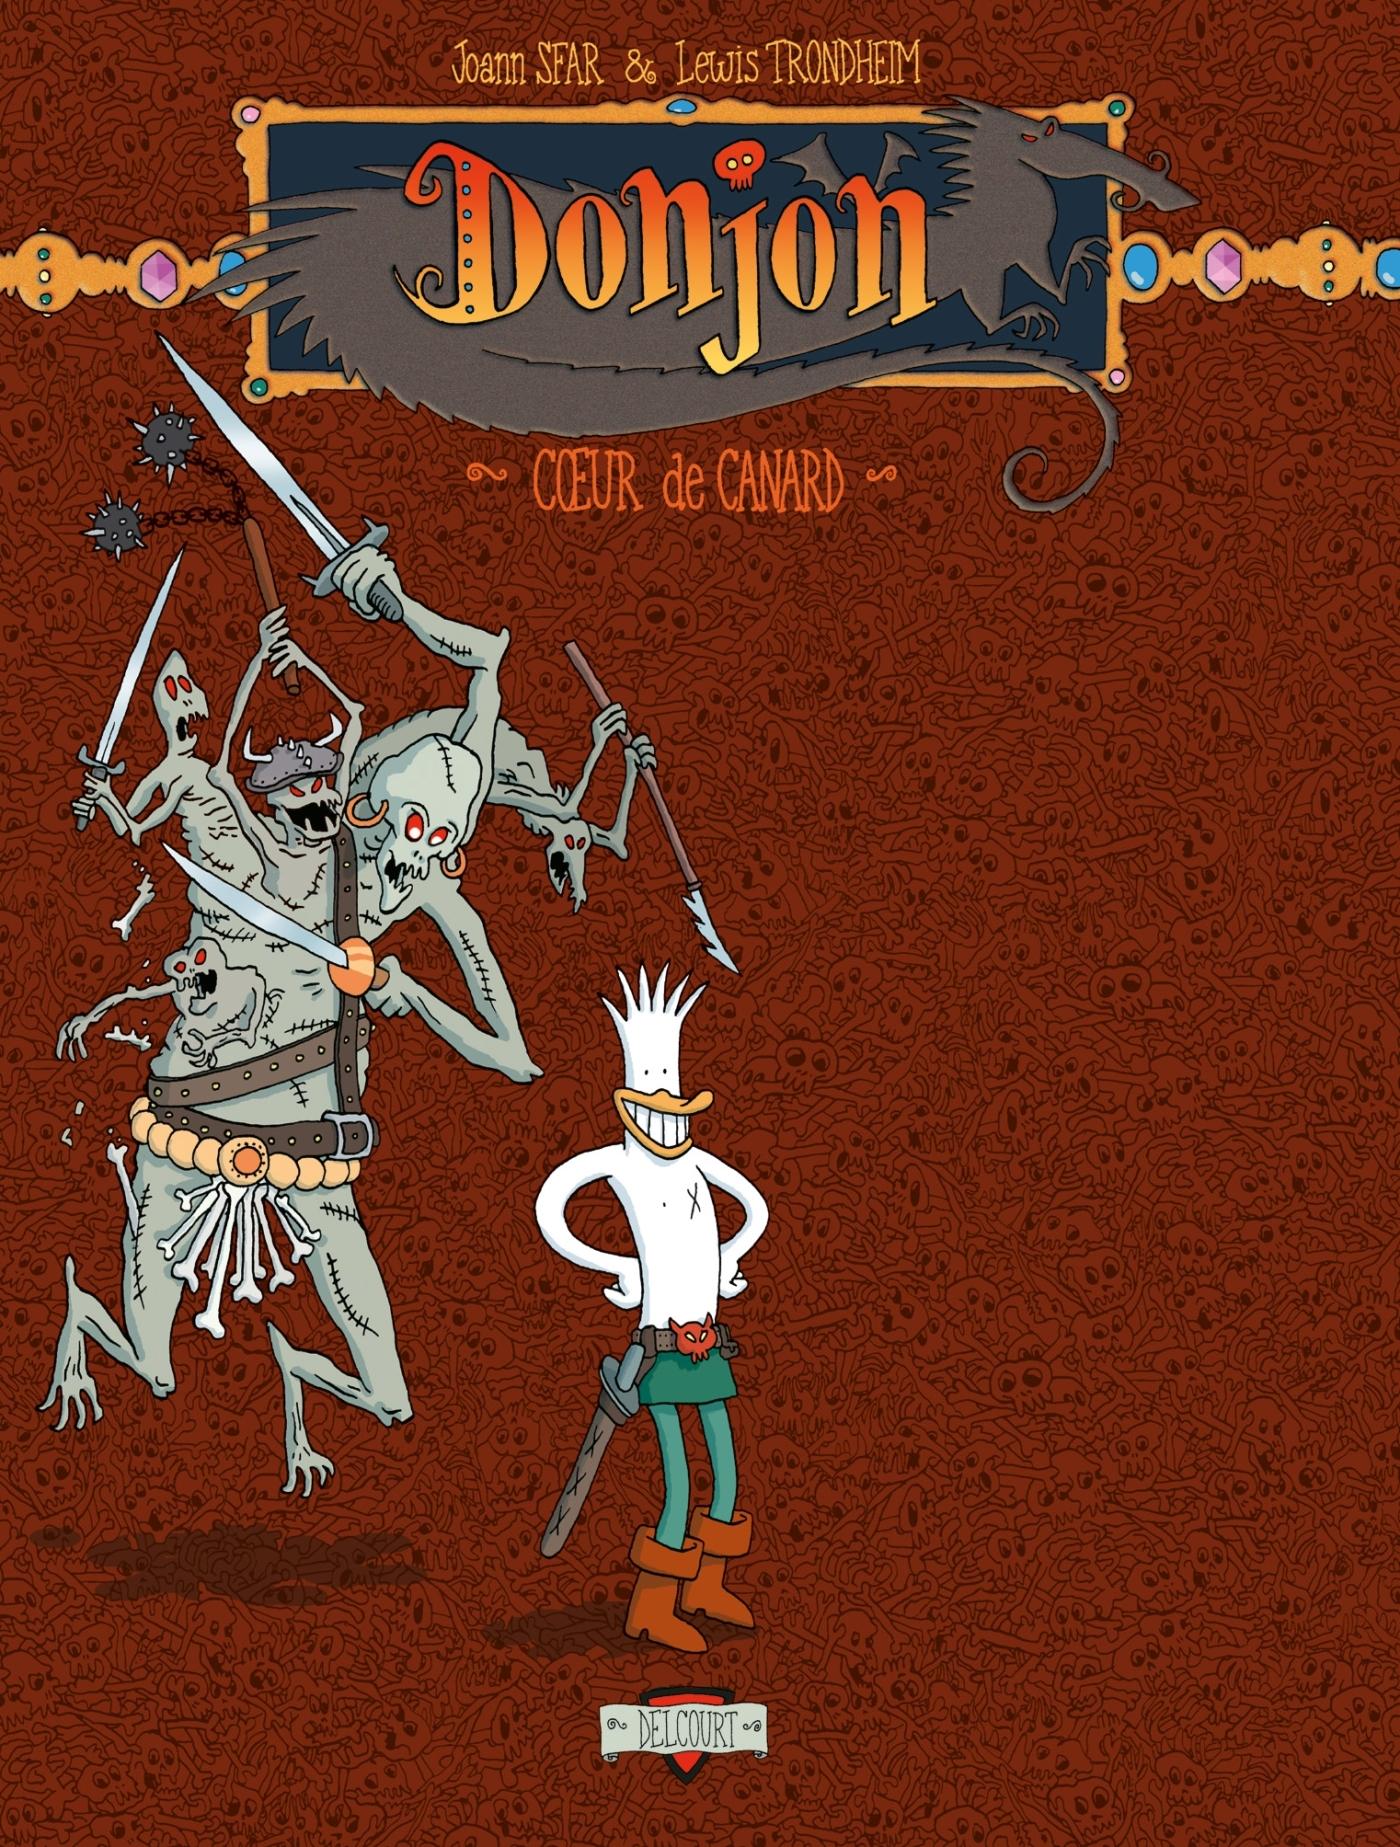 DONJON ZENITH - PACK T01 HC + T02 + T03